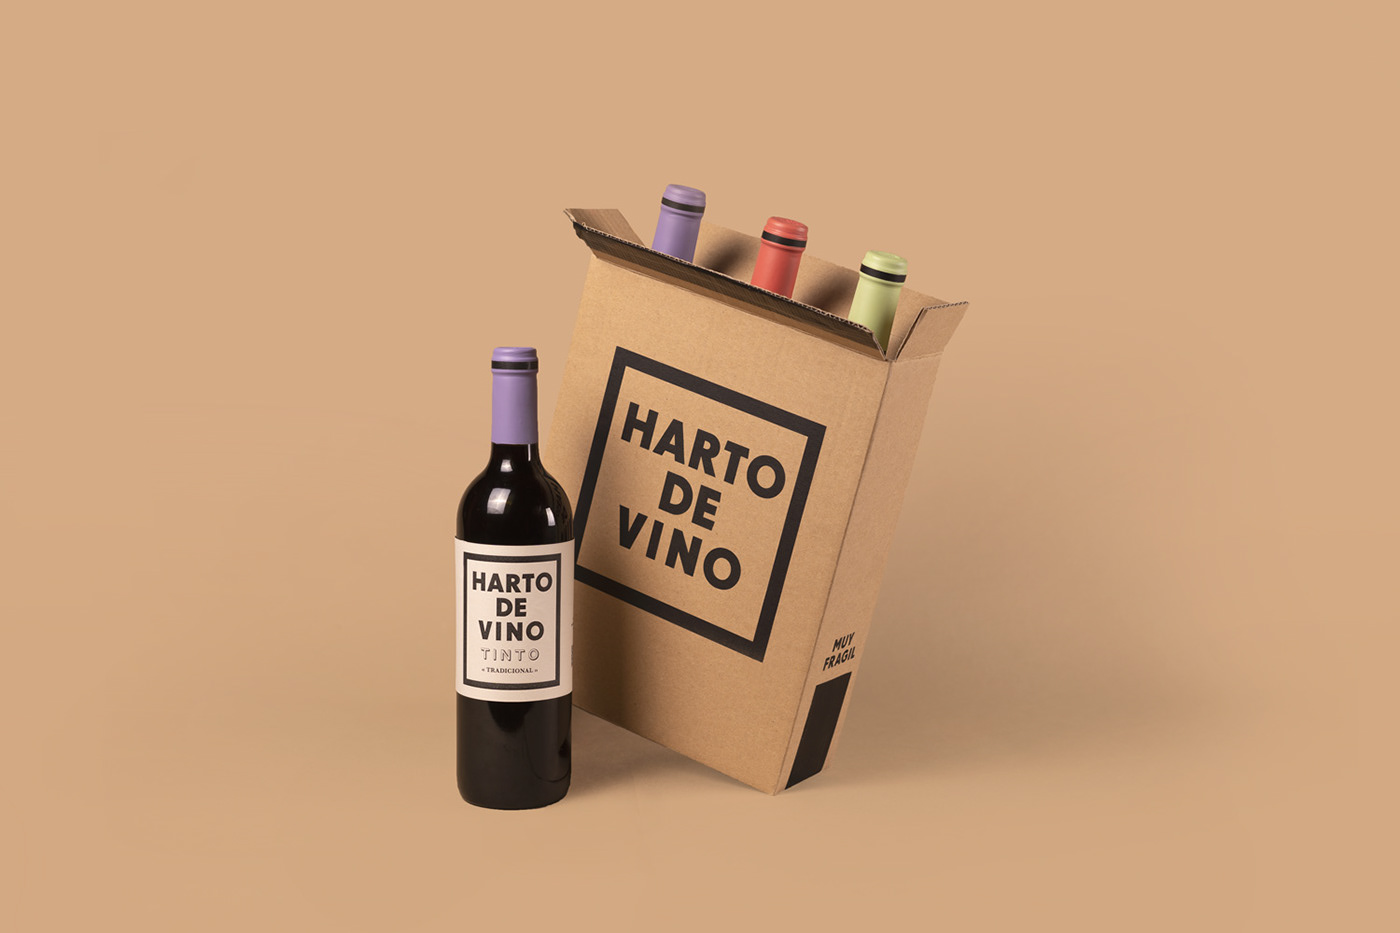 wine vino bodega etiqueta Label hartodevino excedente Ribera del Duero ribera Rivera harto de vino harto ArandadeDuero aranda de duero tinto